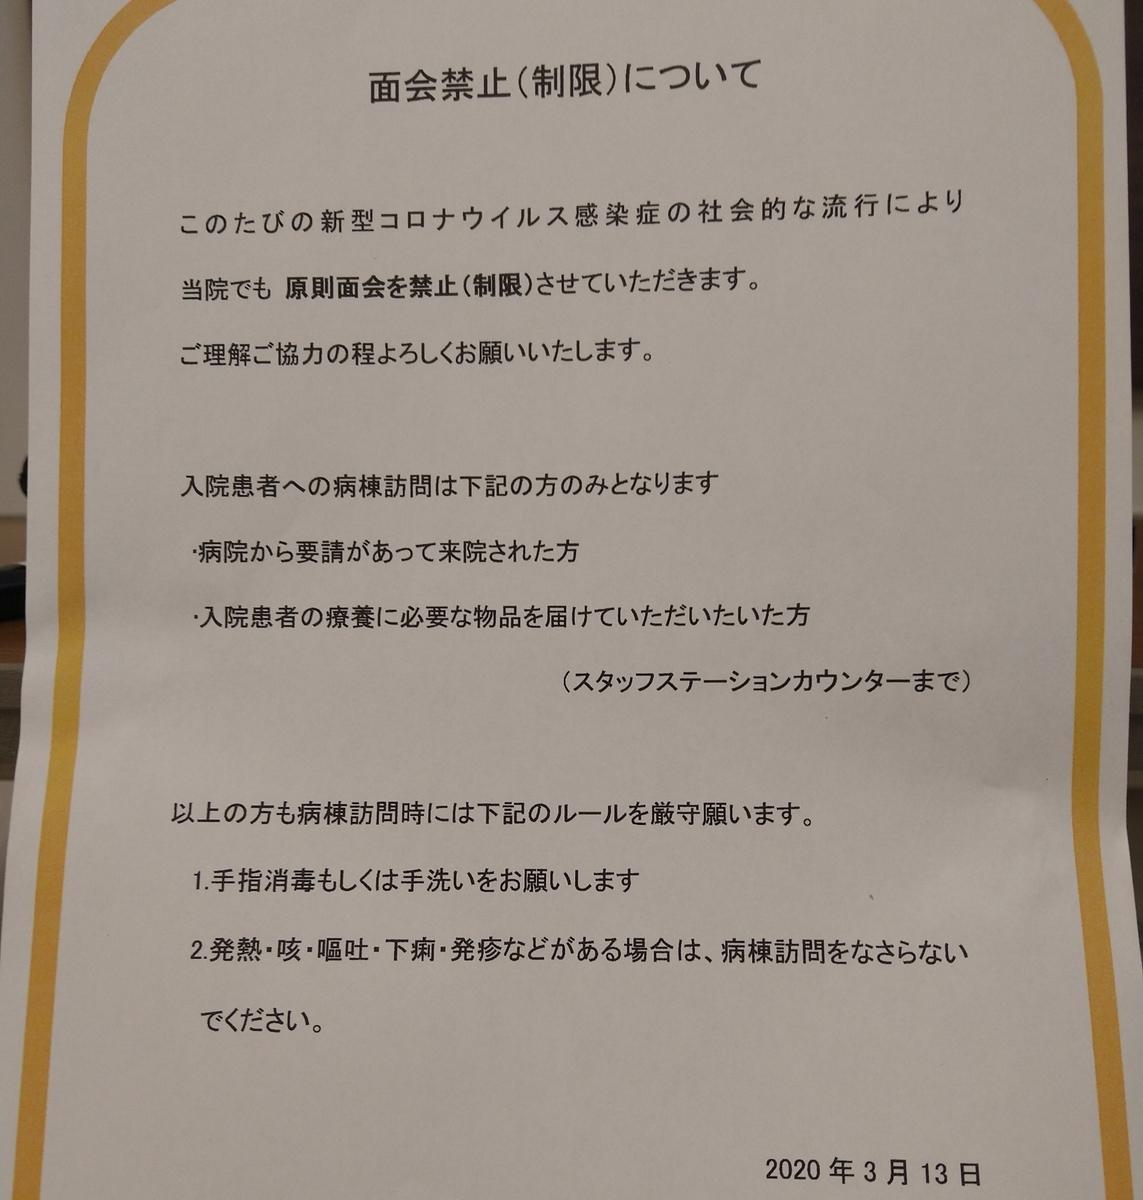 f:id:akihamama:20200320165604j:plain